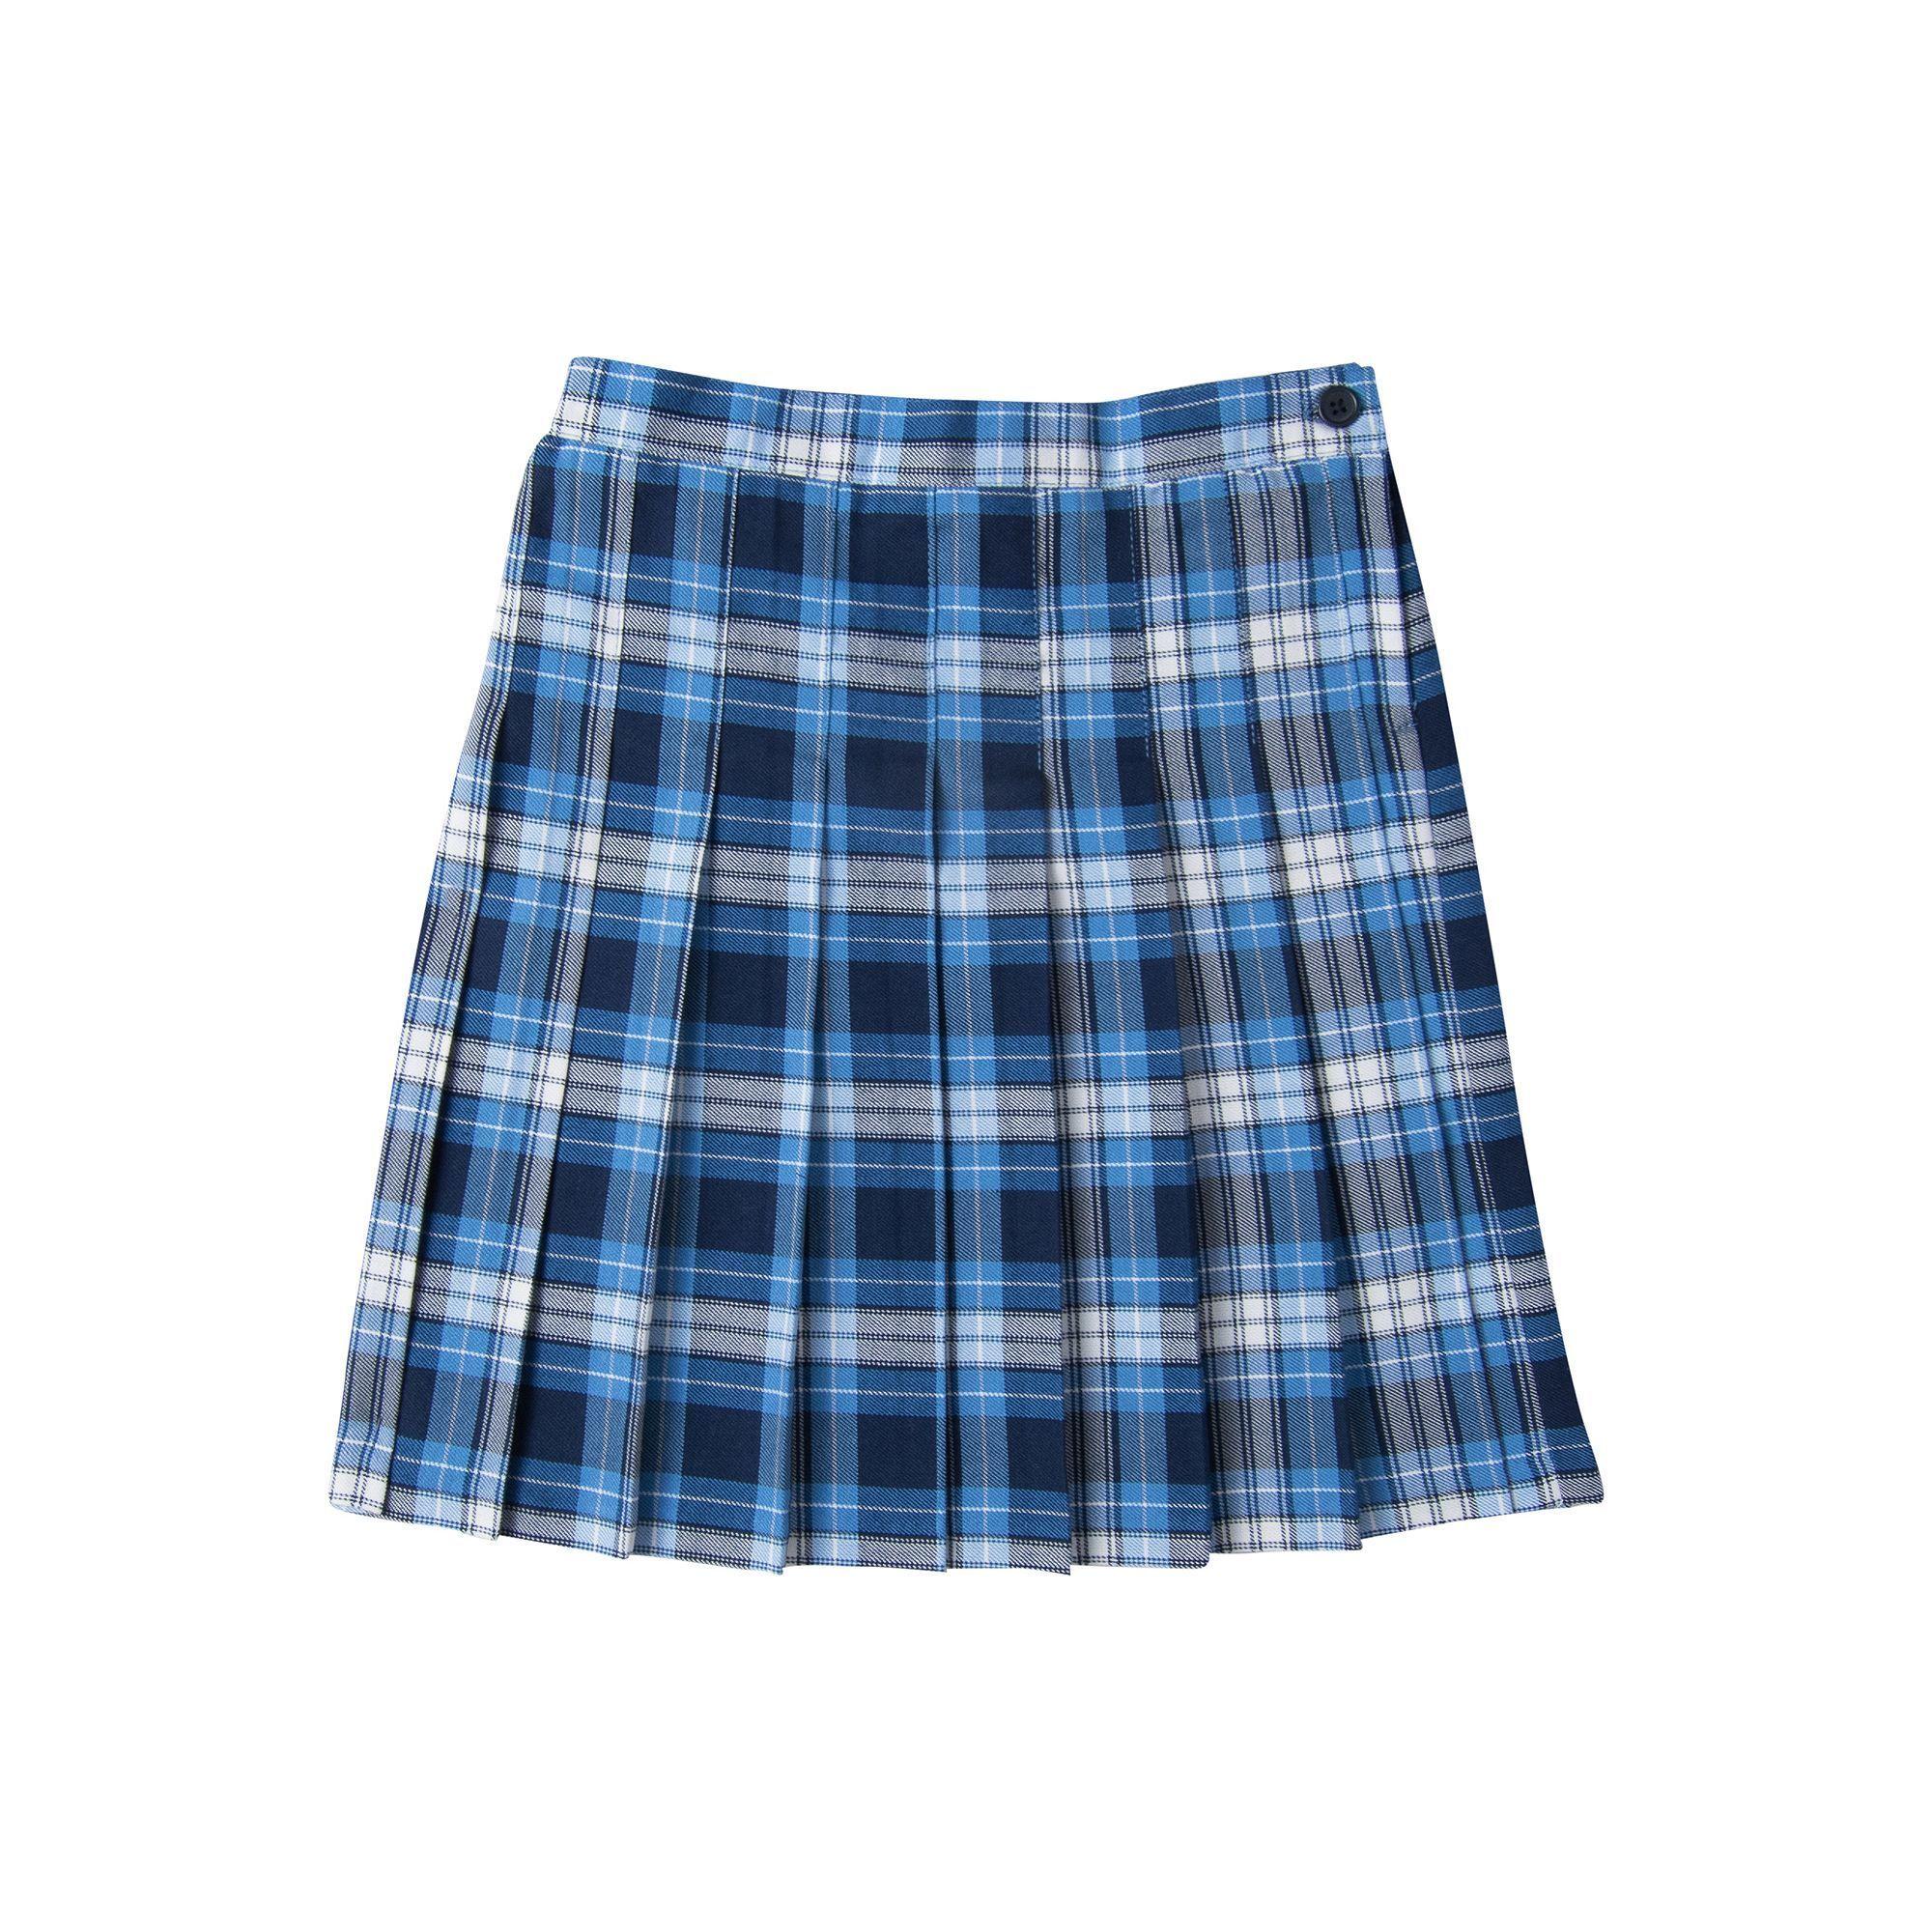 5fe28d4b98 Girls 4-16 Chaps School Uniform Plaid Skirt, Girl's, Size: medium (14),  Turquoise/Blue (Turq/Aqua)